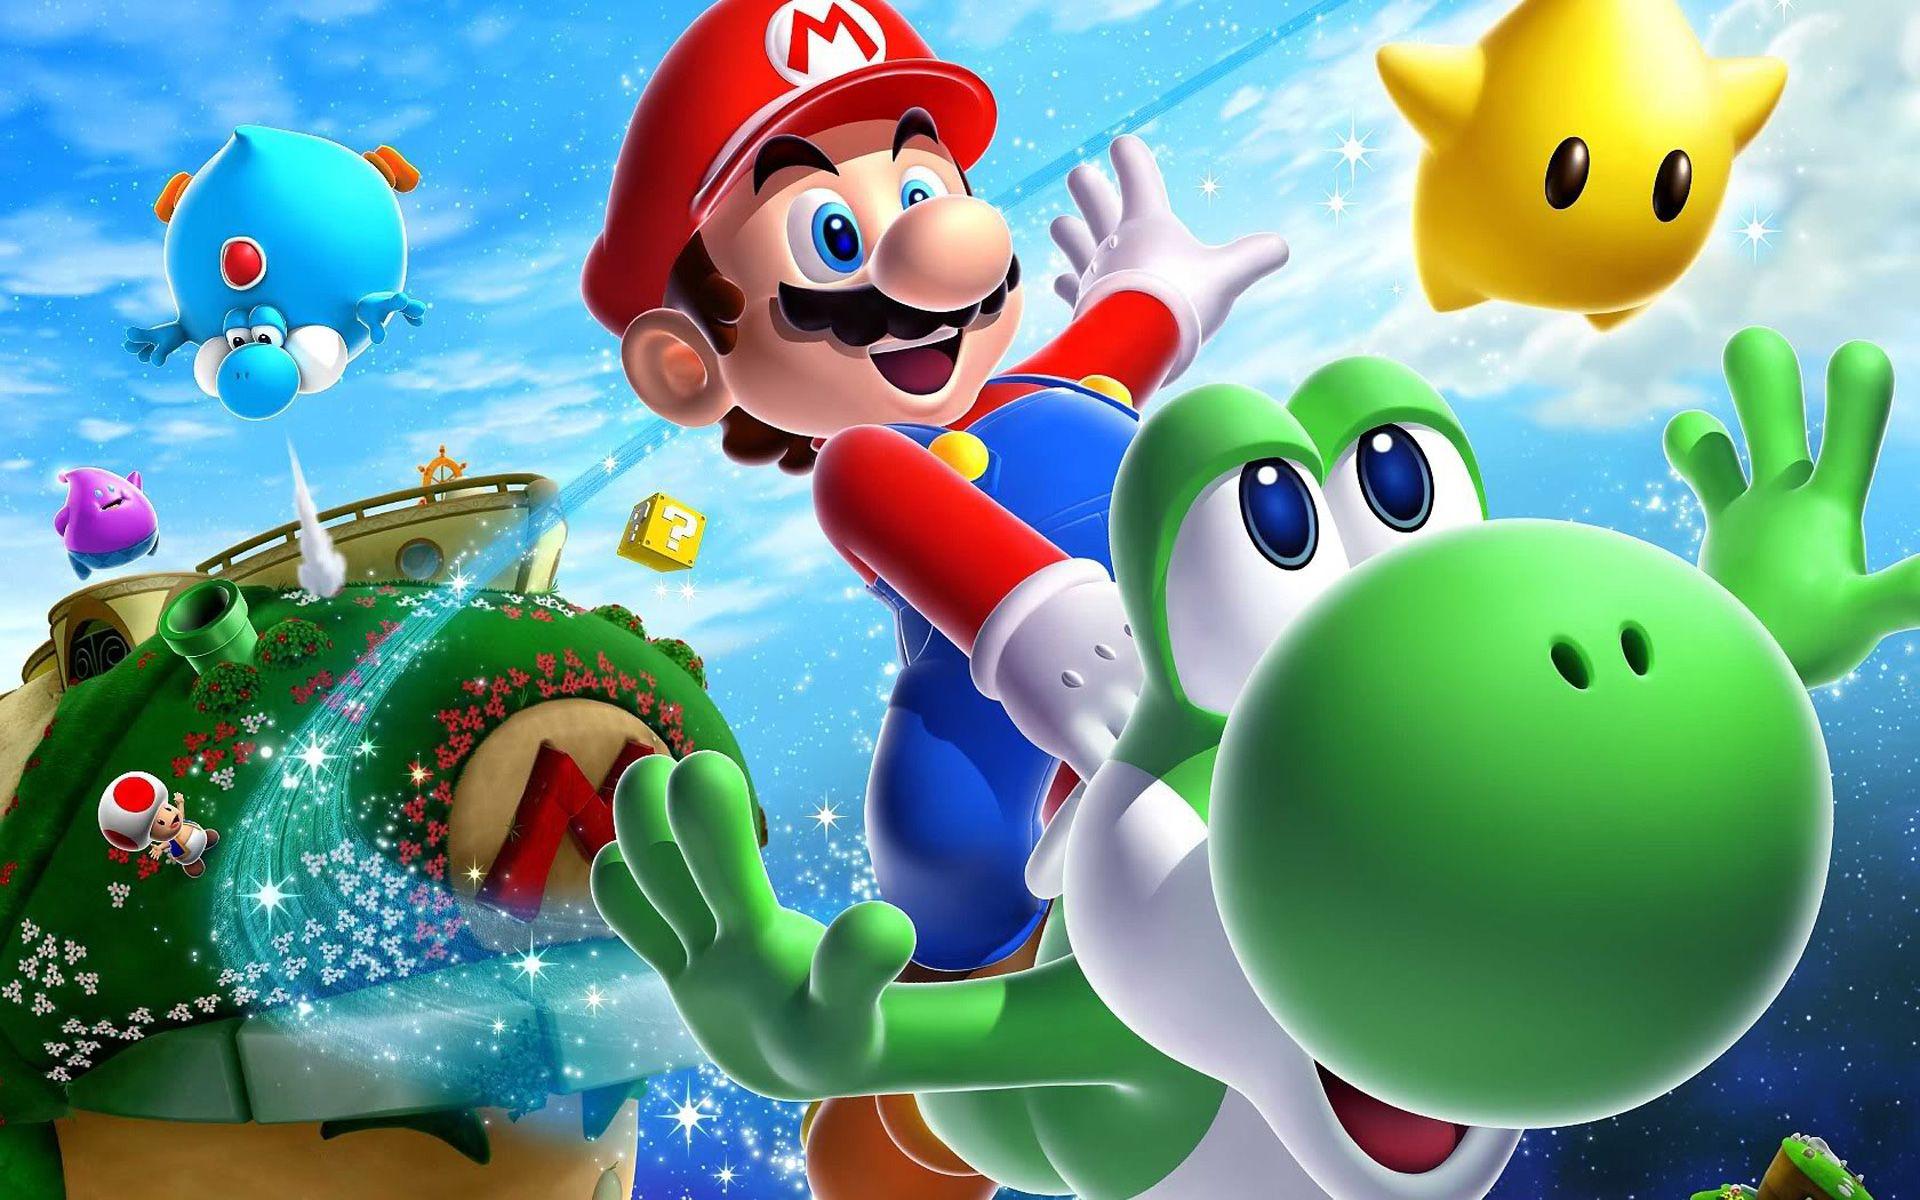 Find Out: Super Mario Galaxy Wallpaper On Http://hdpicorner.com/